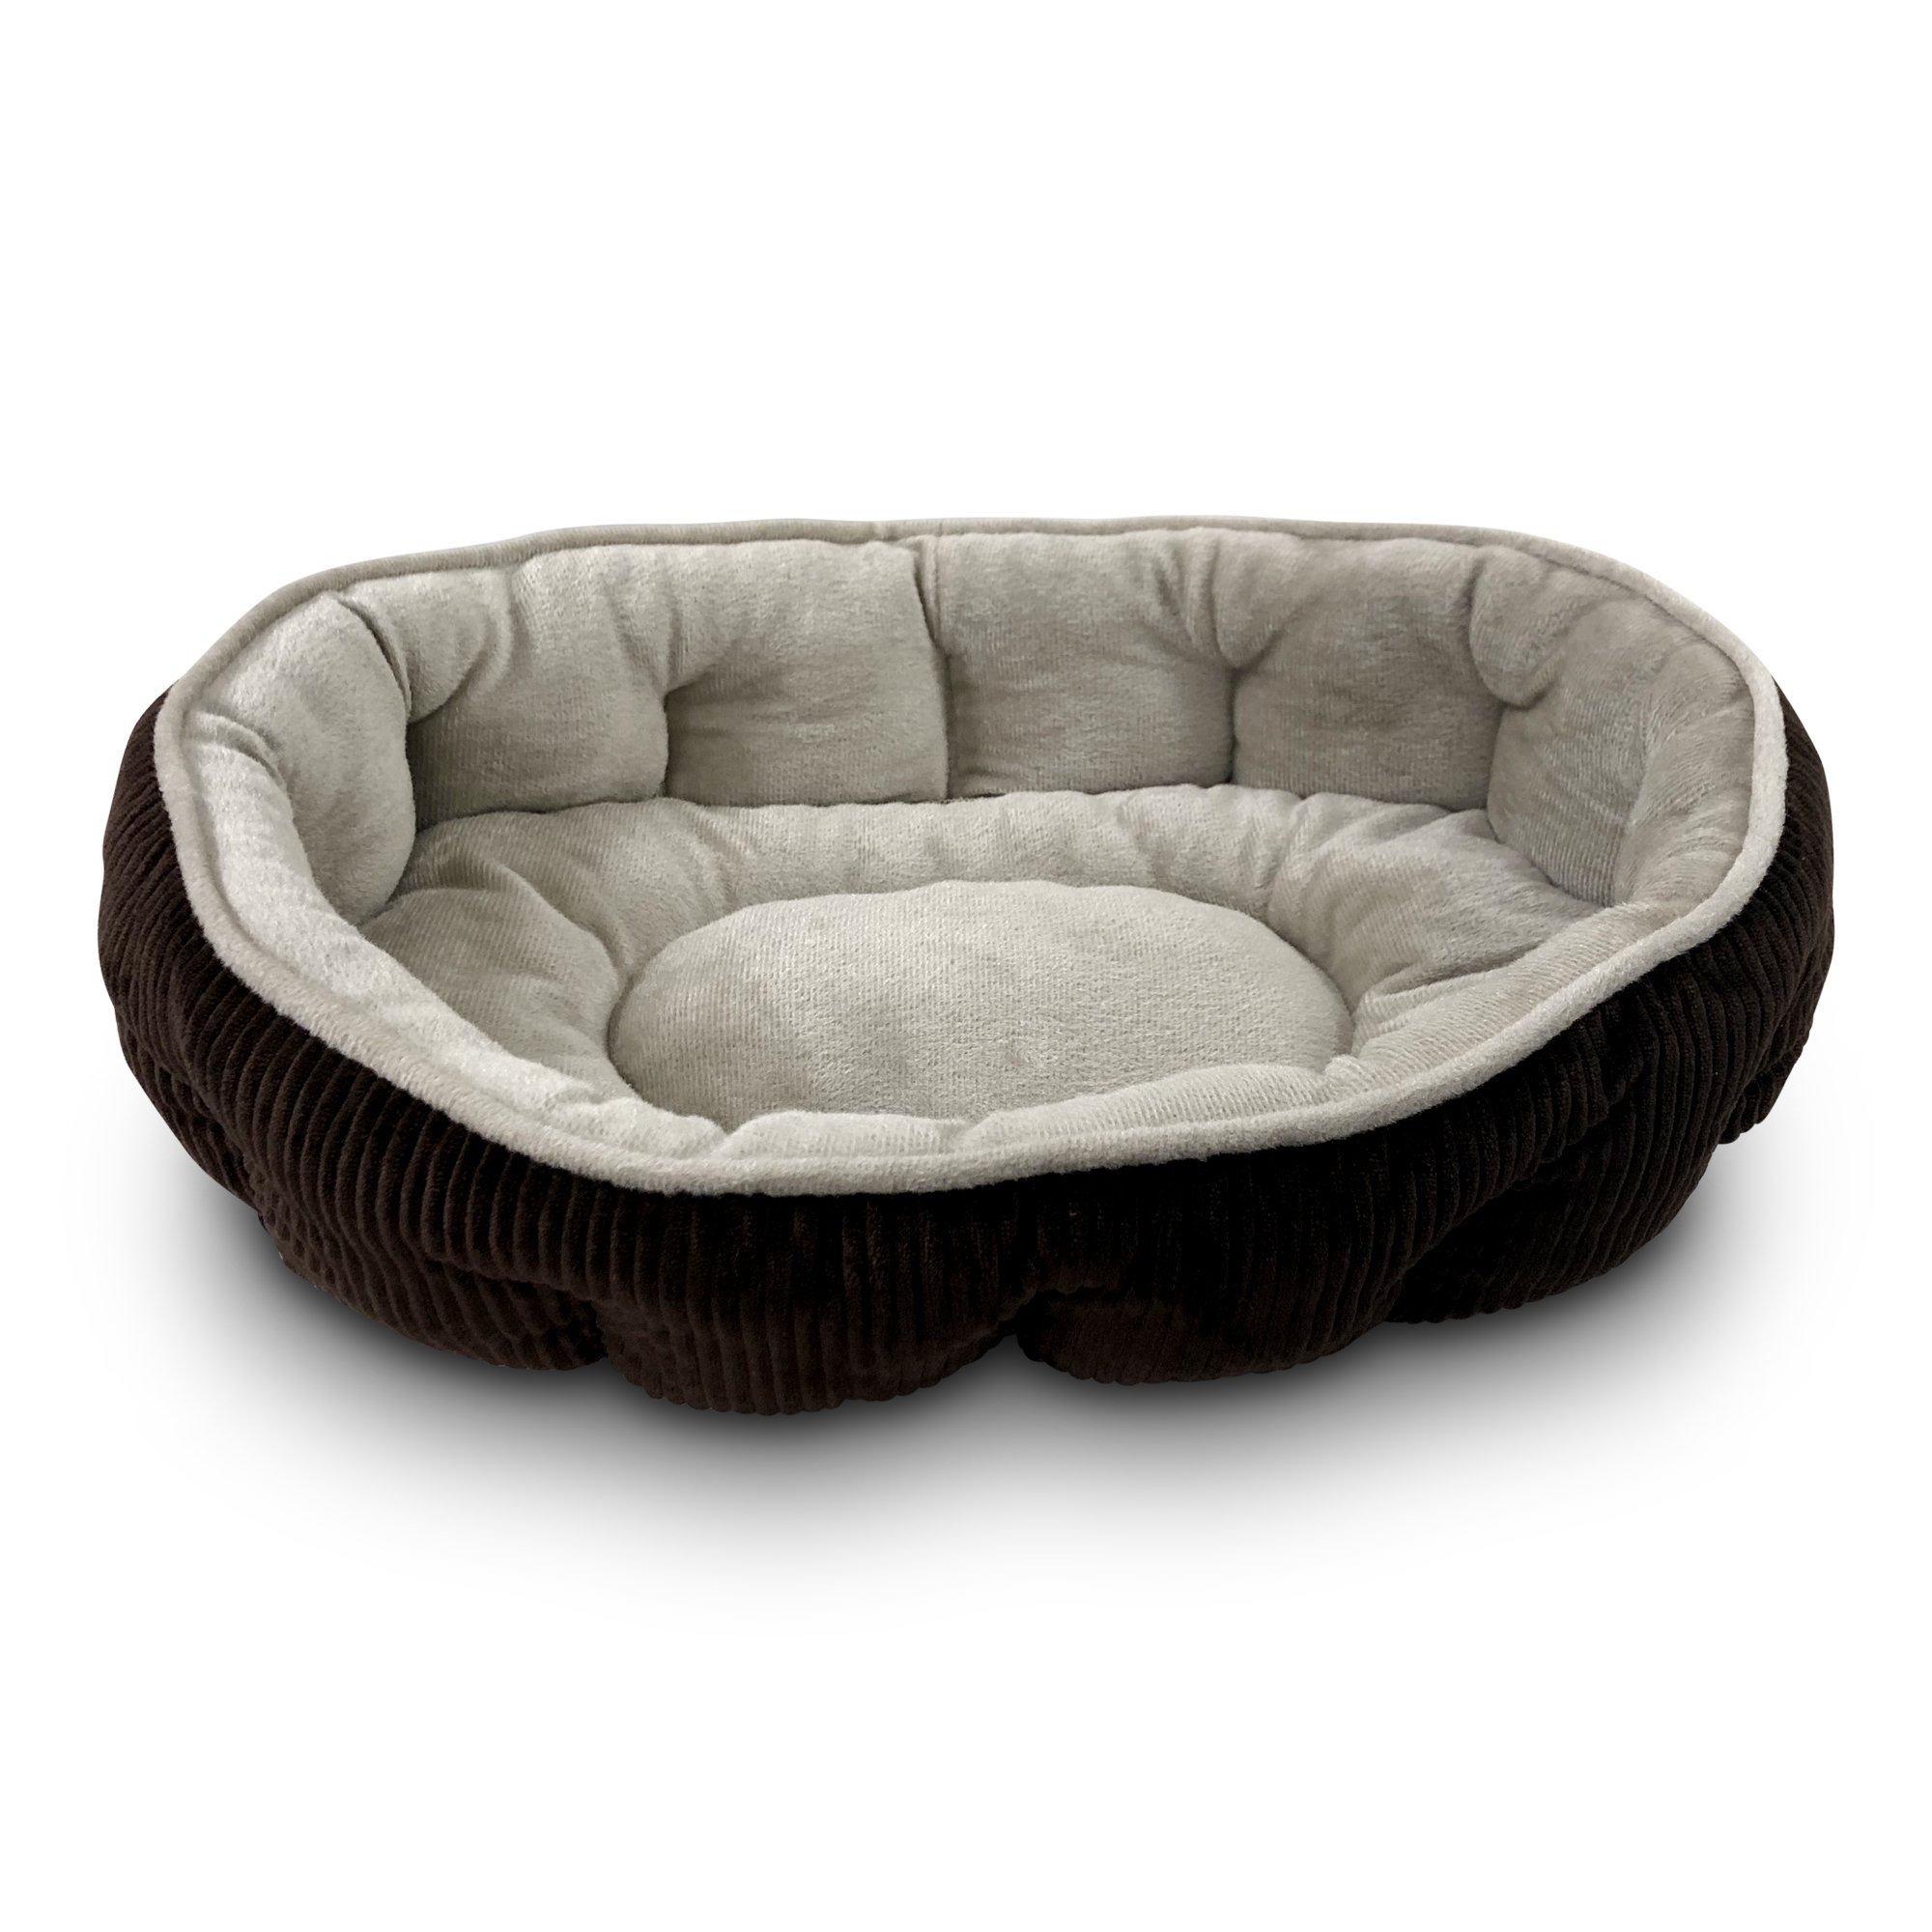 Pet Craft Supply Simple Sleeper Premium Comfy Cat Bed Catnip Pouch